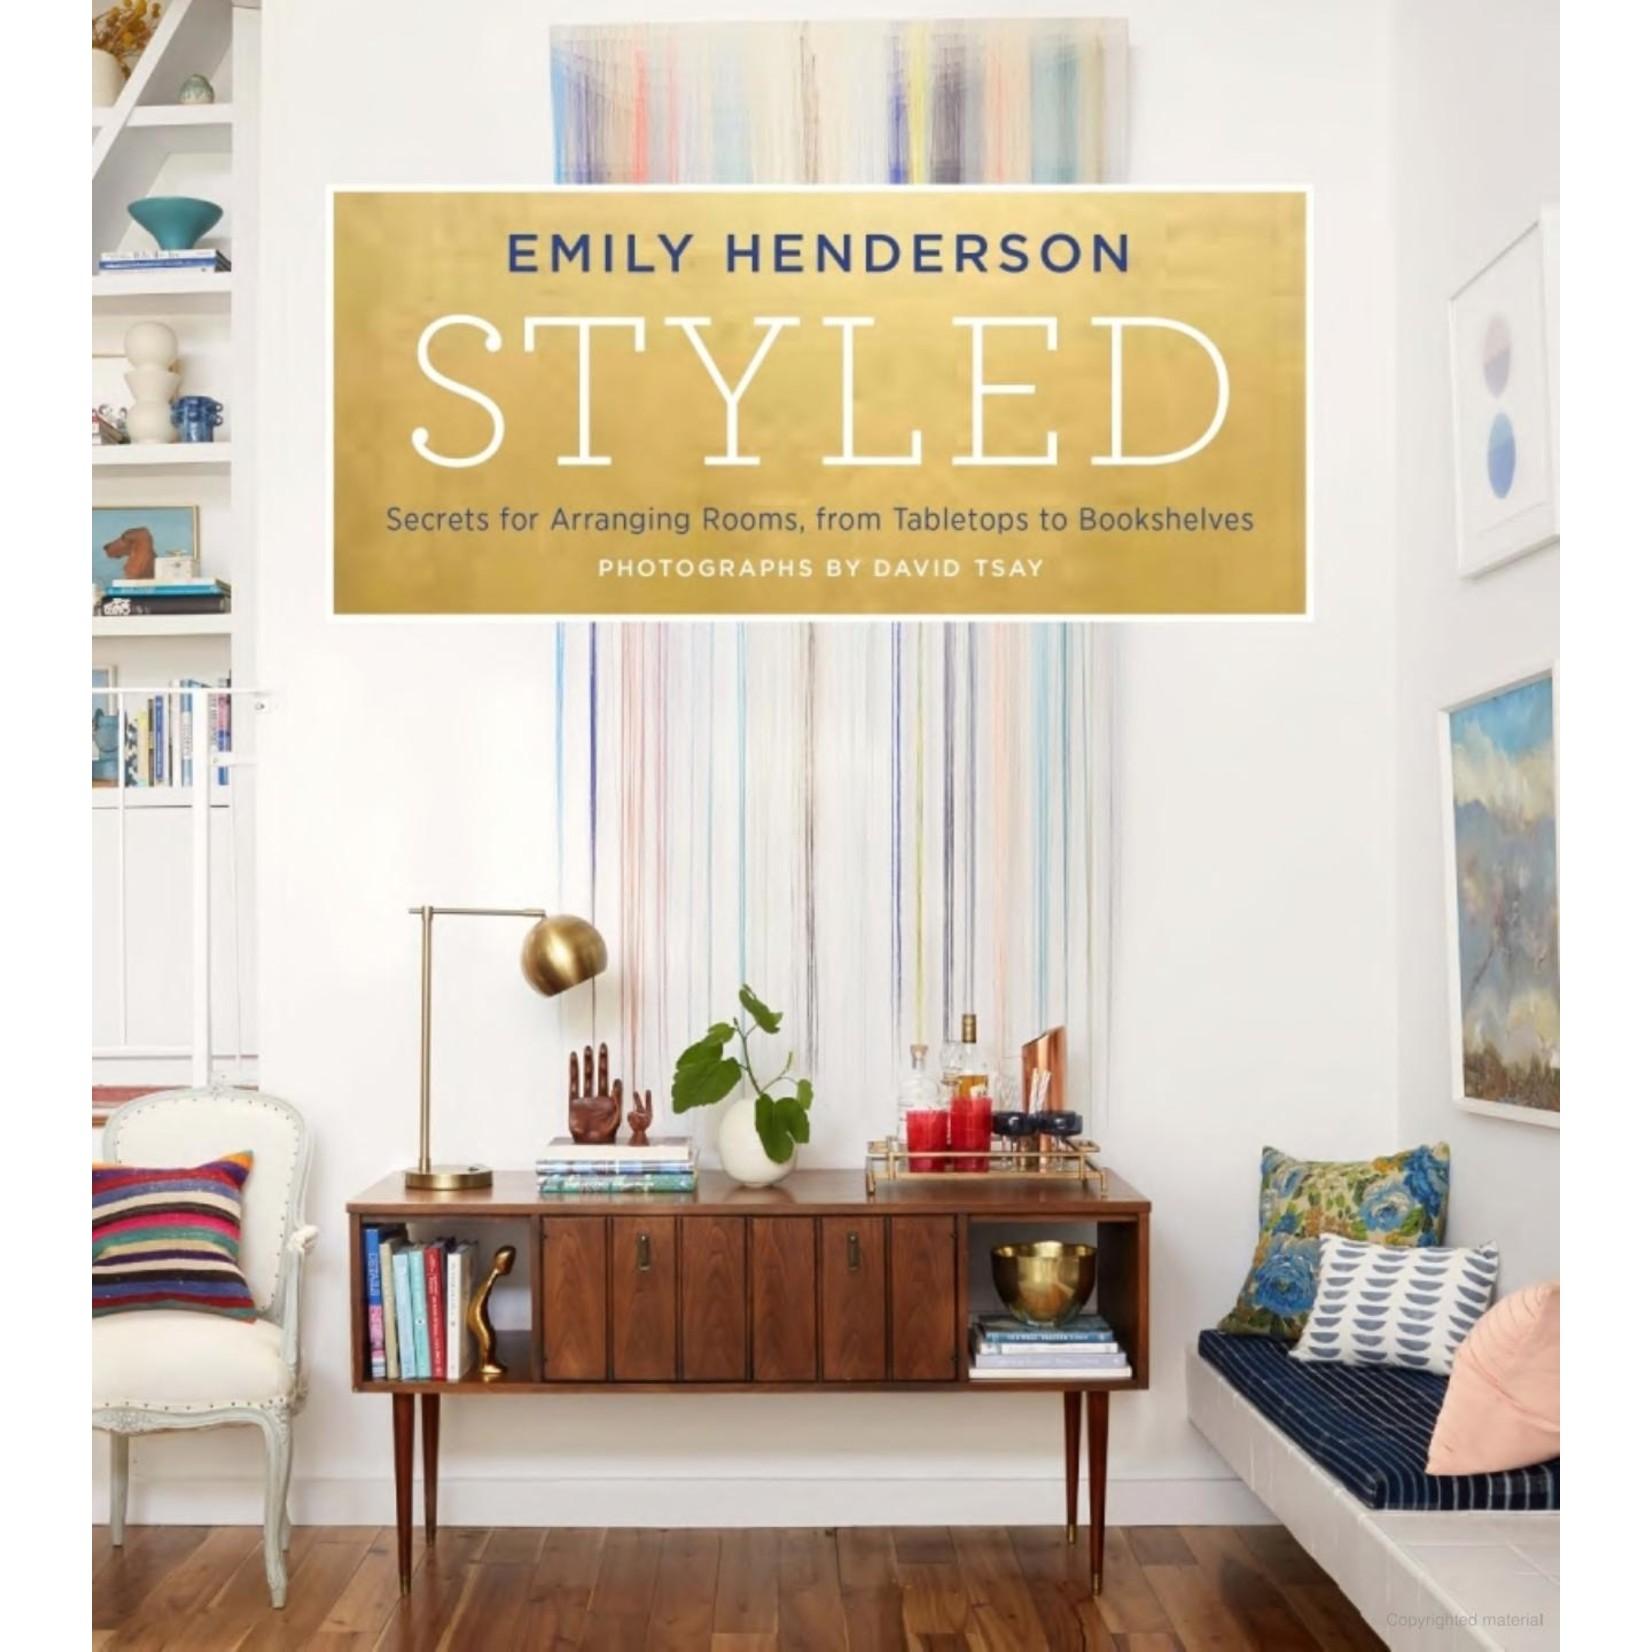 Penguin Random House Styled: Secrets for Arranging Rooms